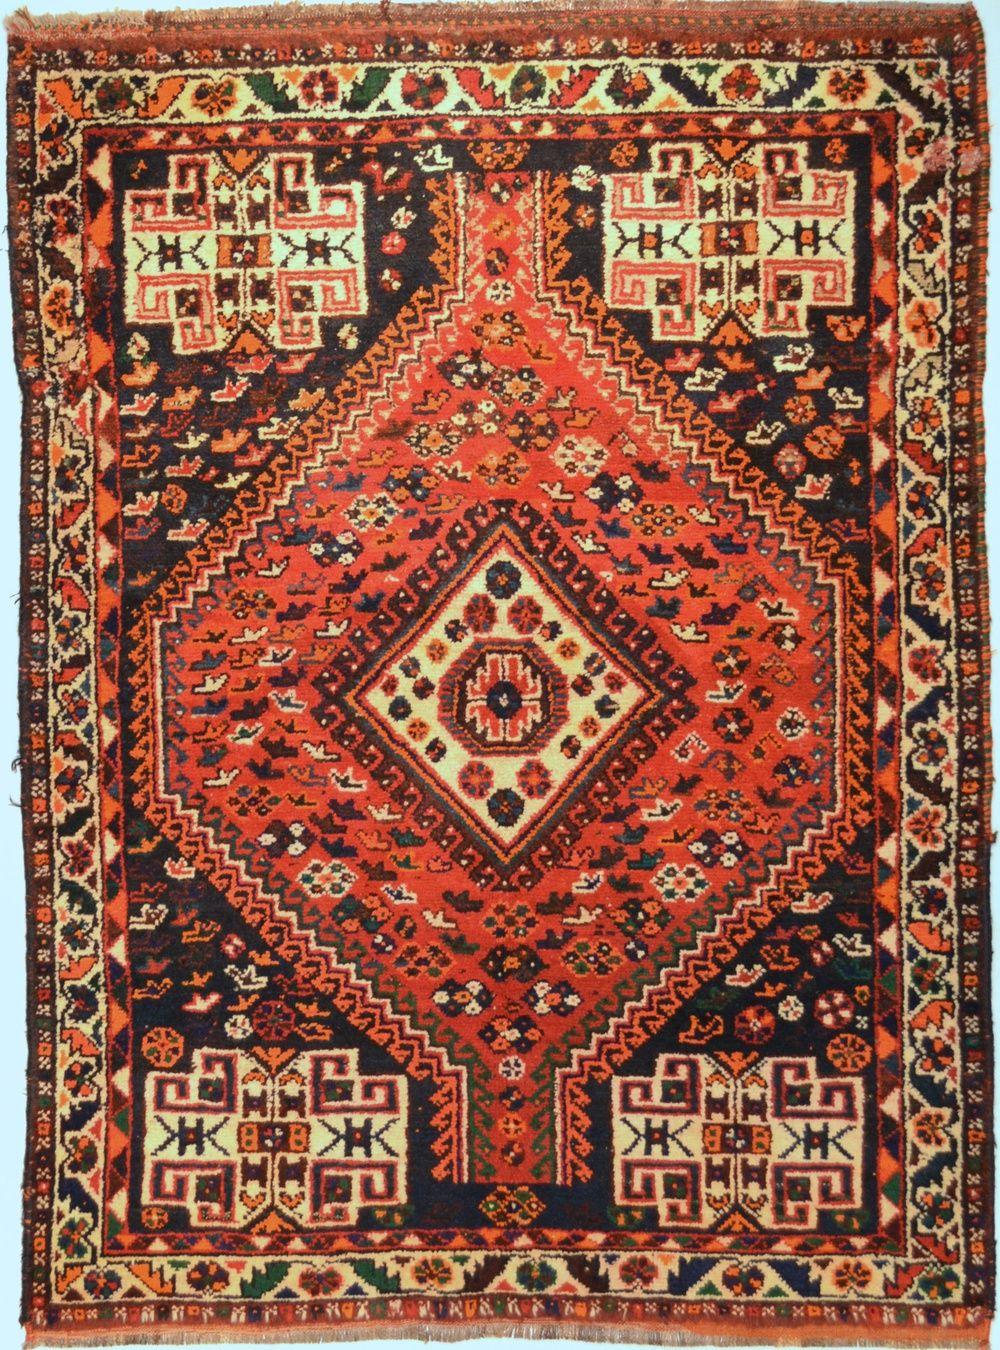 Shiraz Rug Chicago Rugs Kilims Shiraz Rugs Rugs Antique